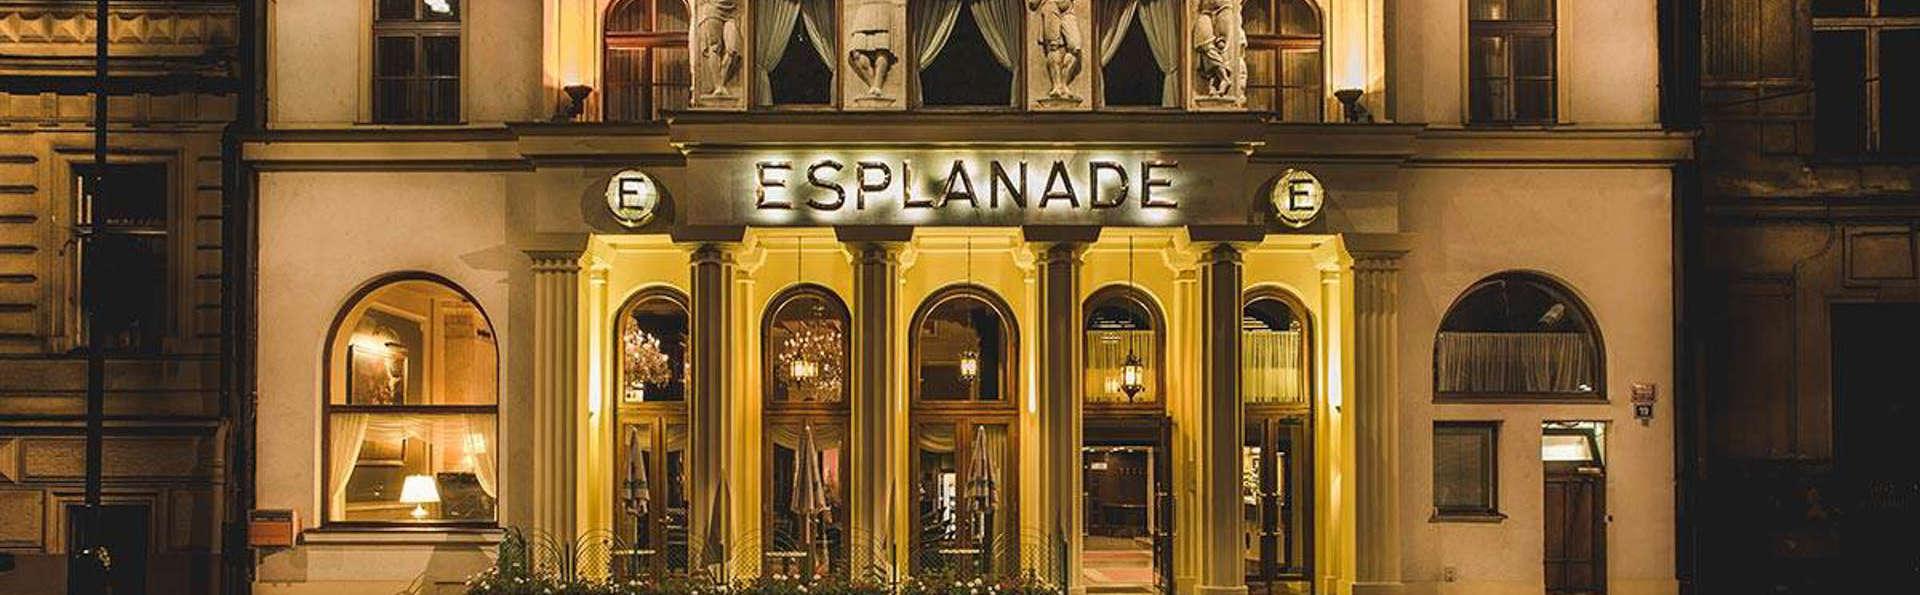 Esplanade Hotel Prague - EDIT_FRONT2.jpg